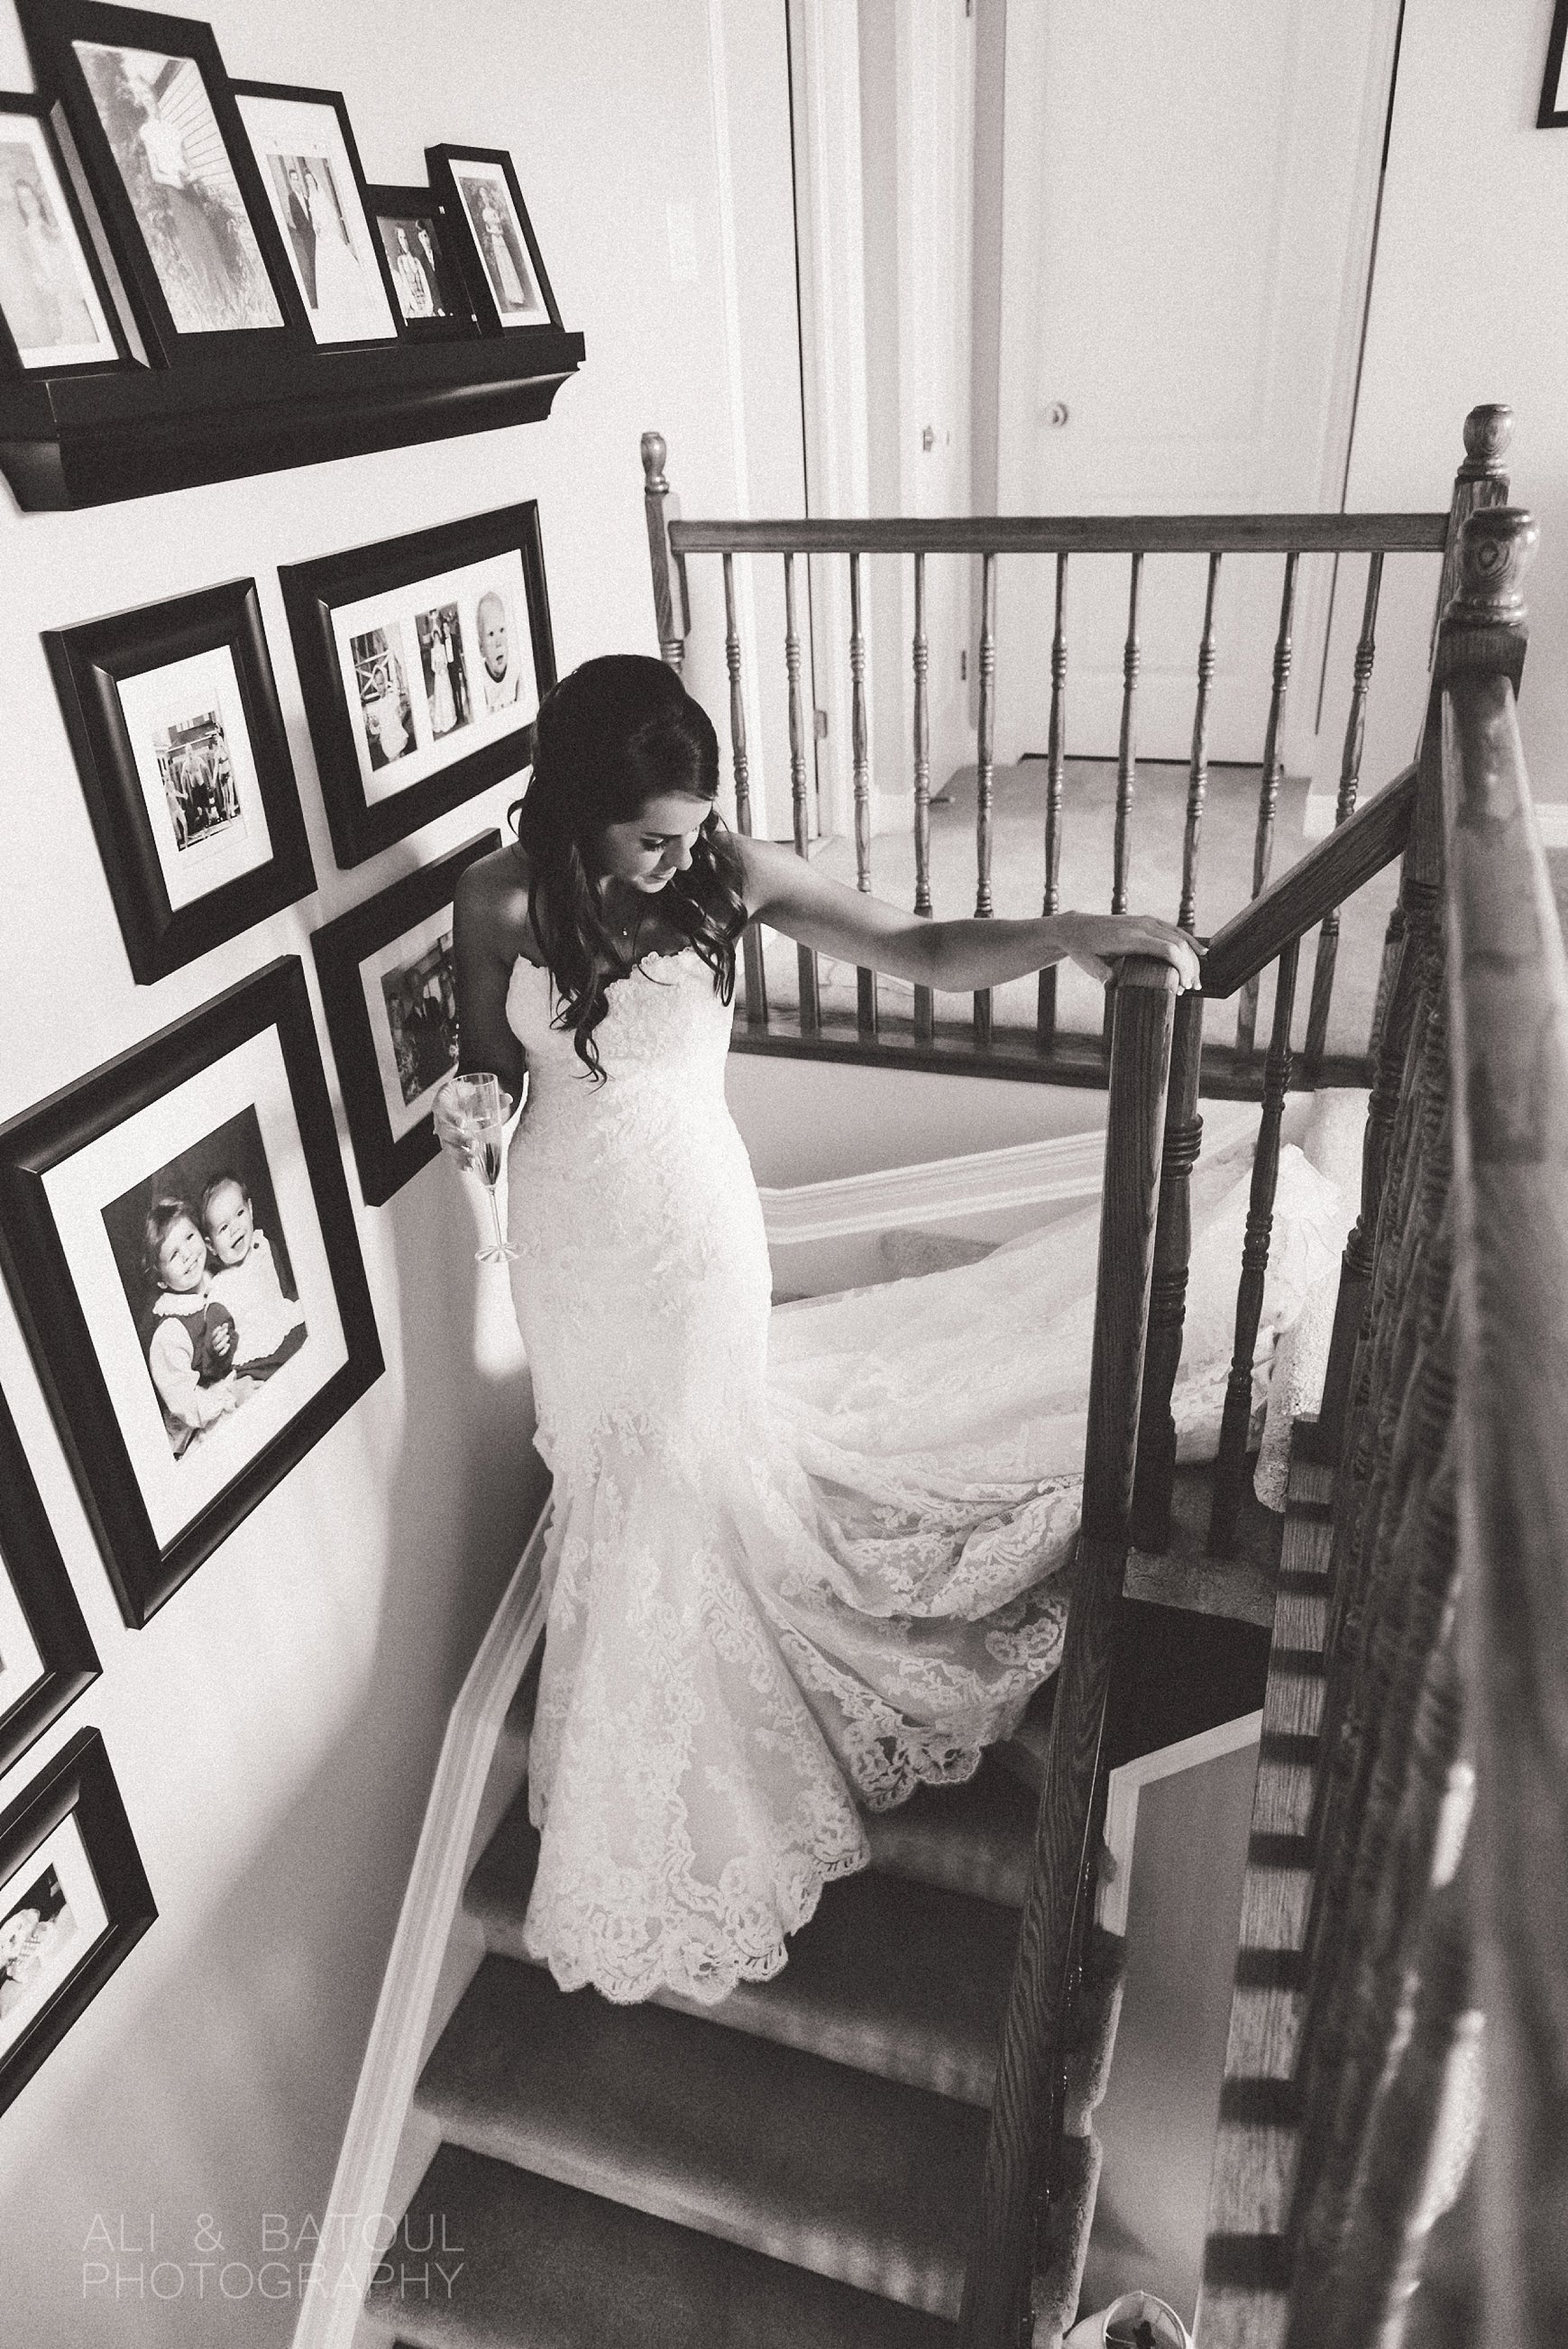 Ali & Batoul Photography - Documentary Fine Art Ottawa Wedding Photography_0012.jpg